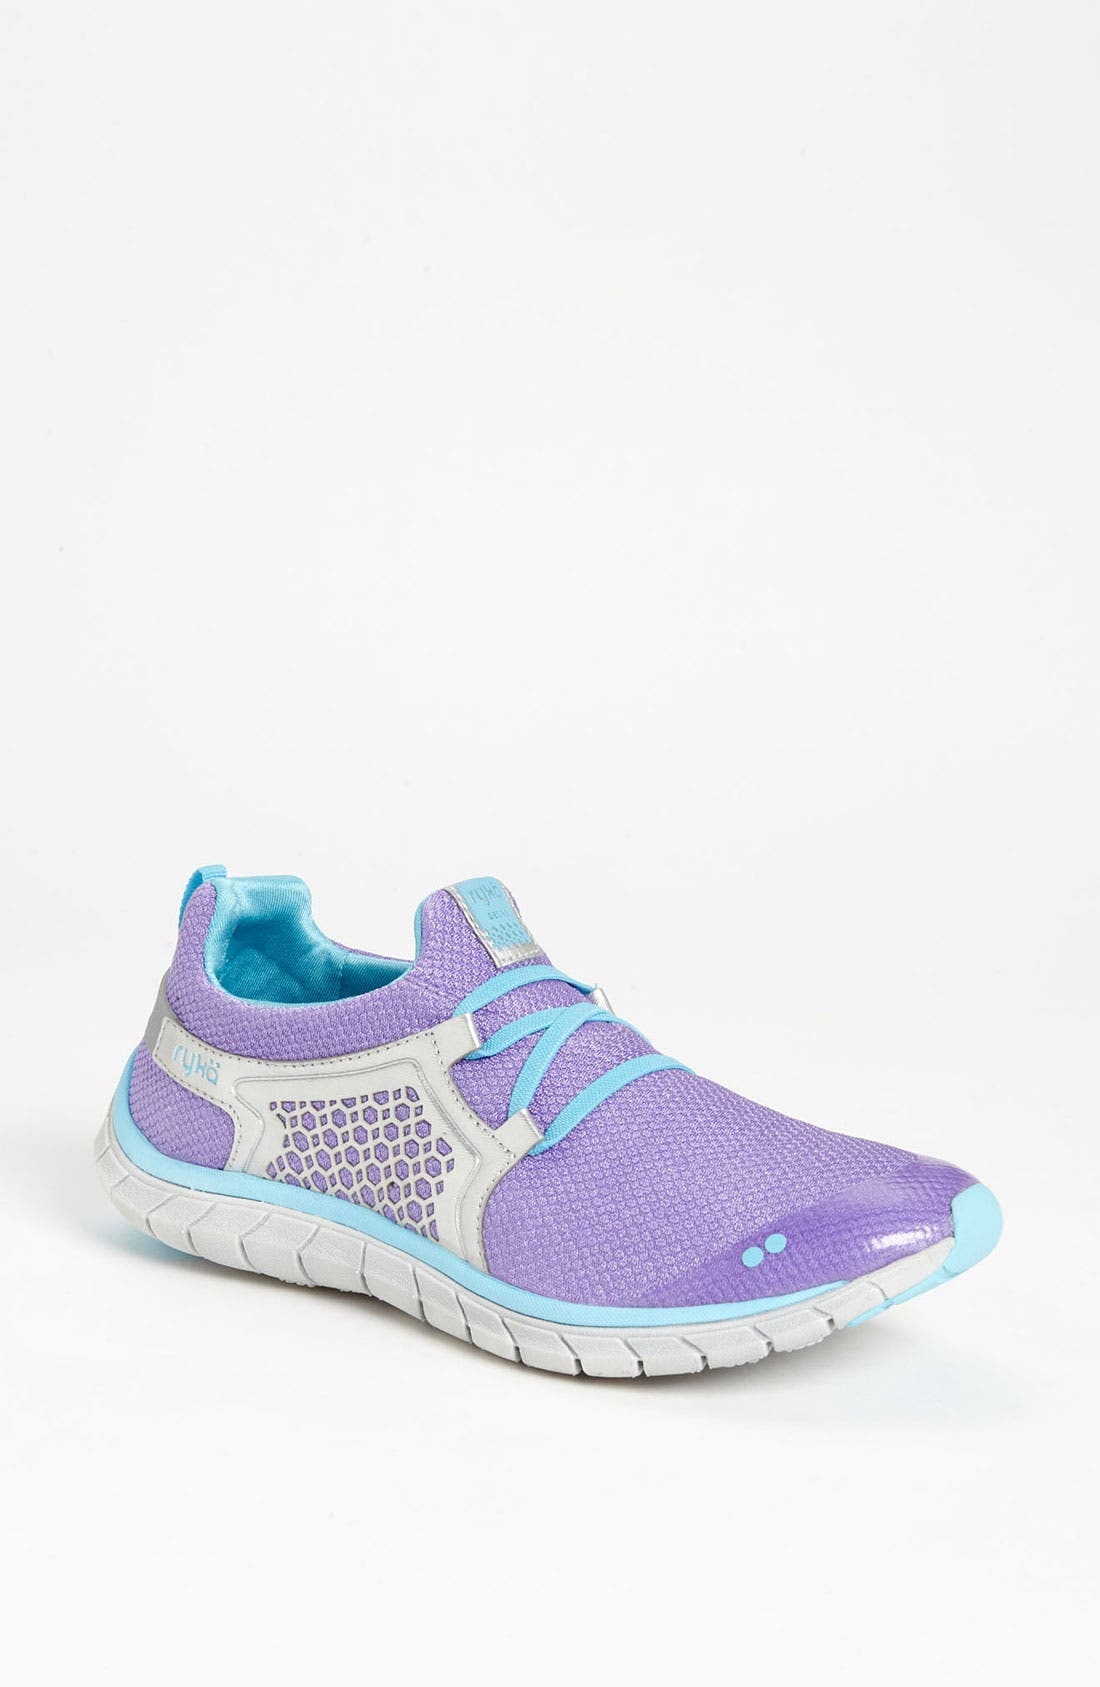 Main Image - rykä 'Desire' Training Shoe (Women)